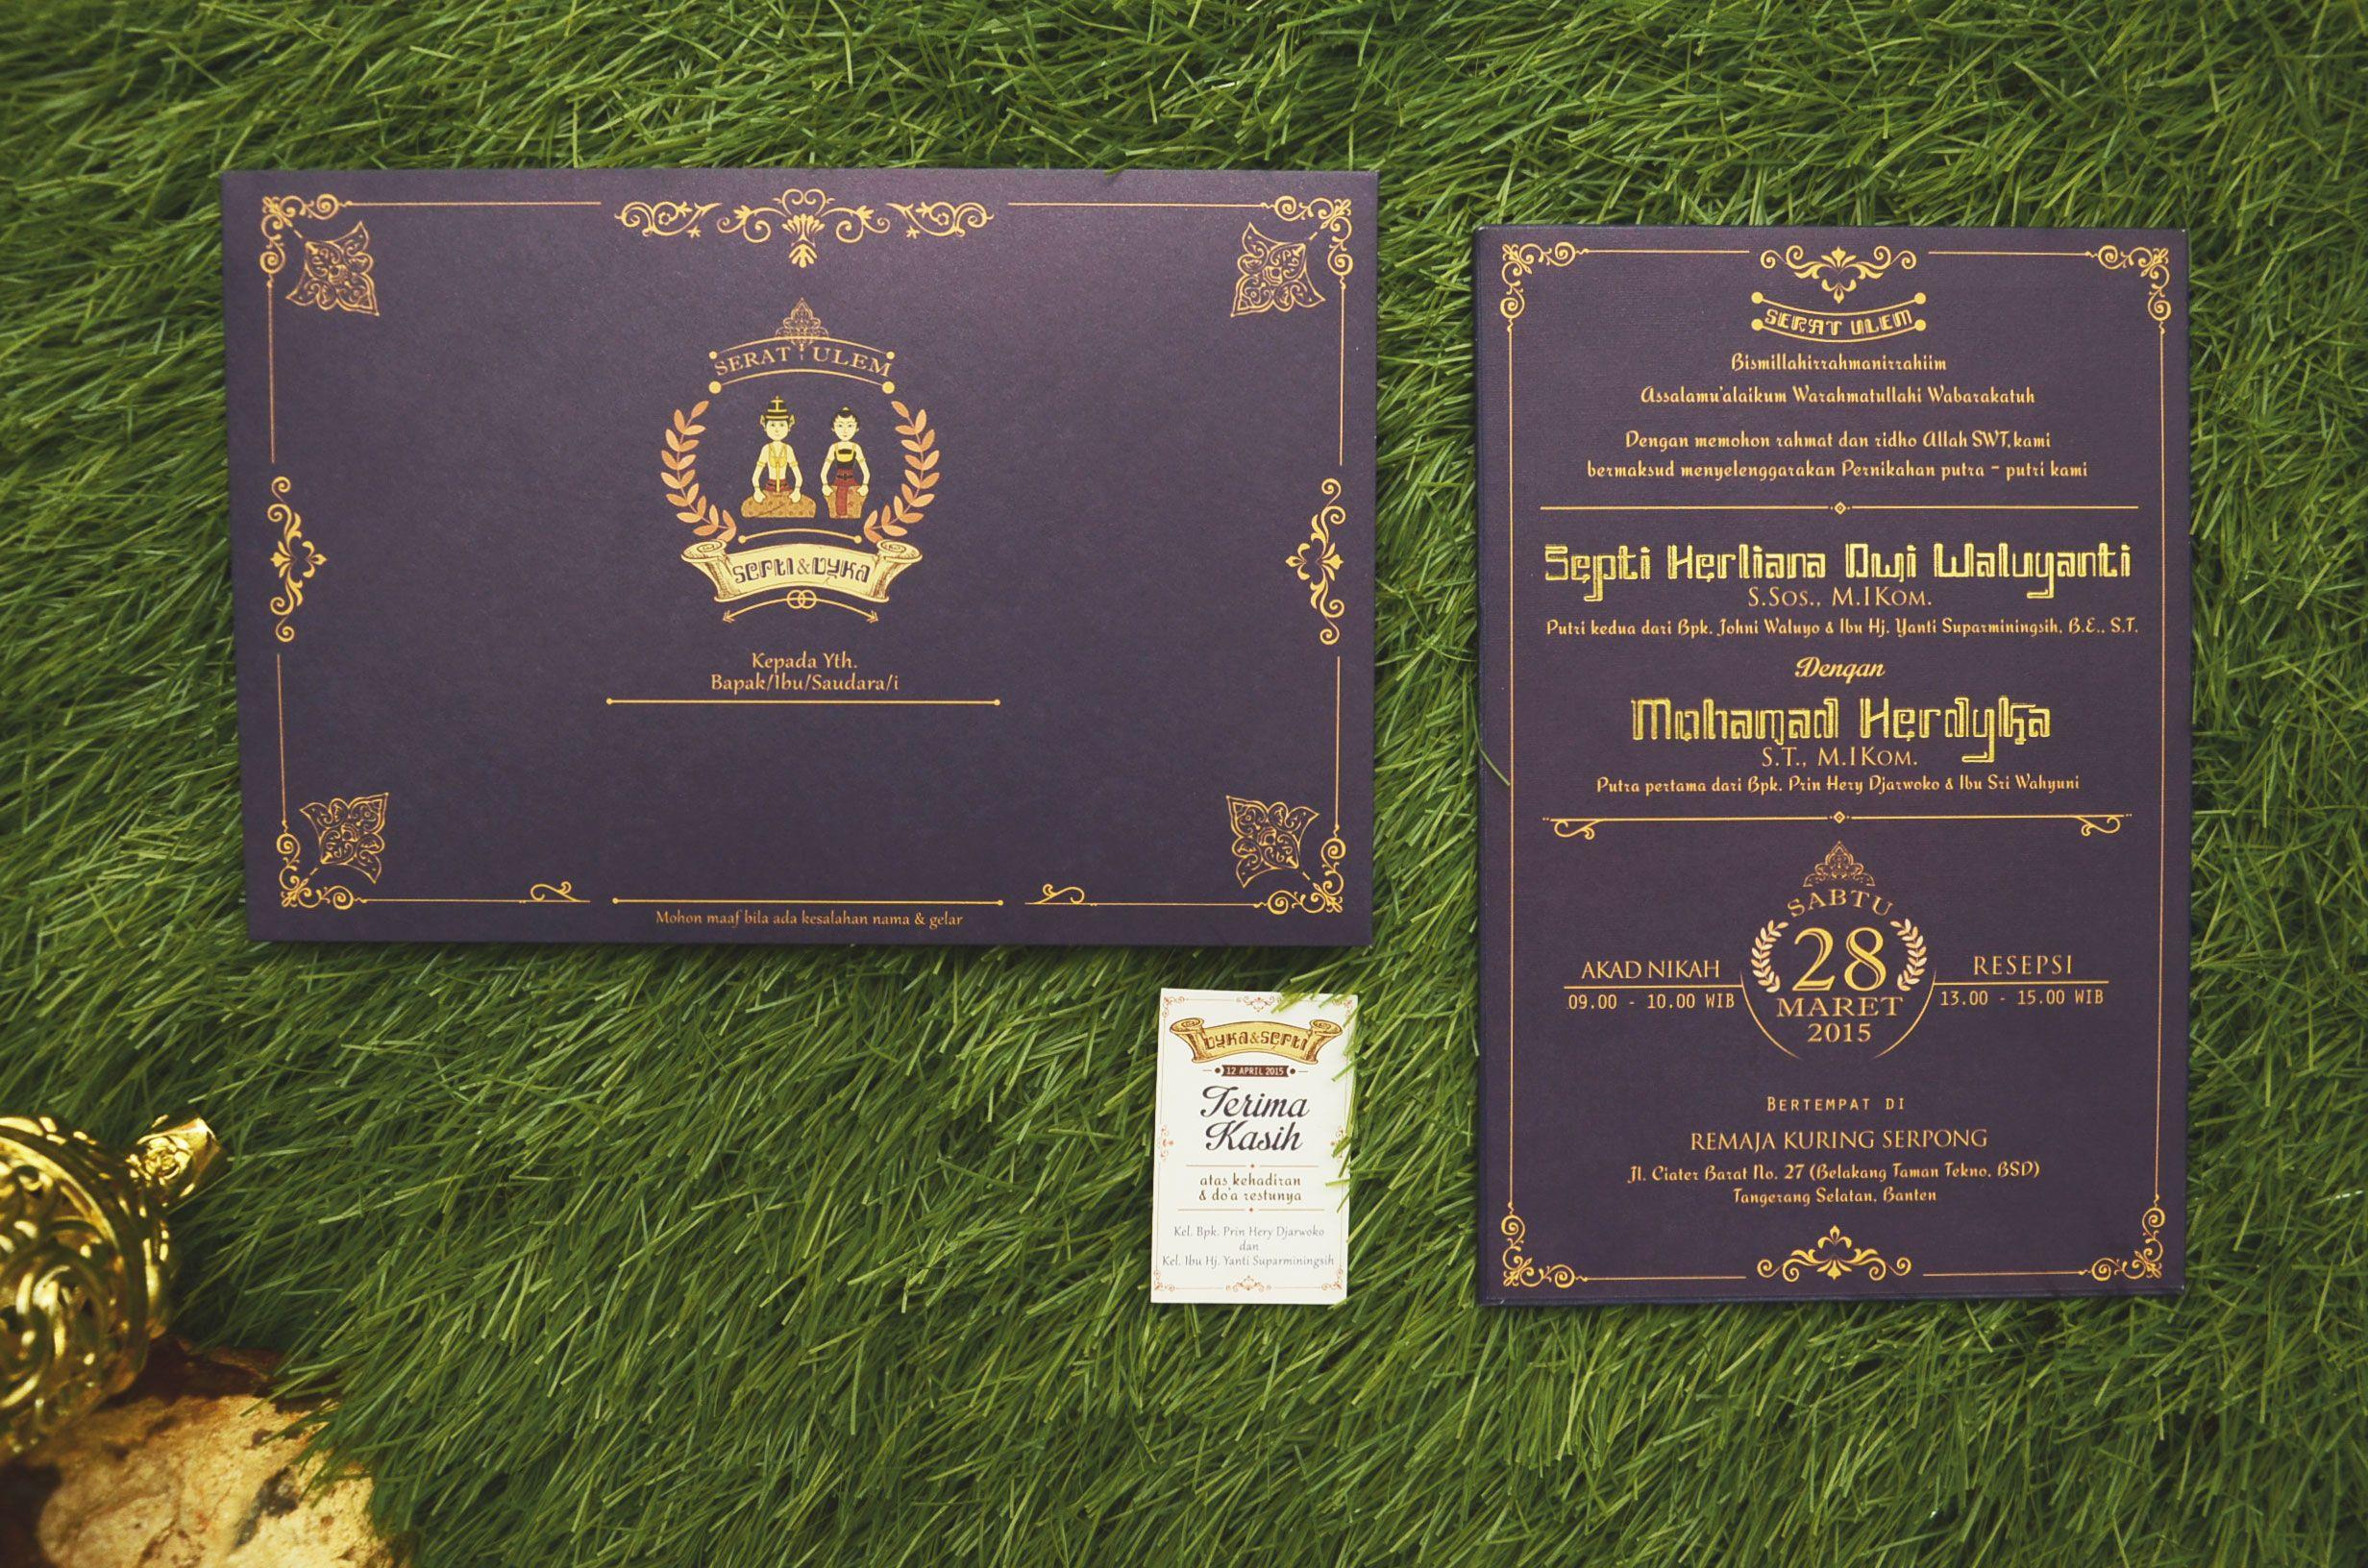 Septi And Dyka Wedding Invitation Undangan Perkawinan Kartu Undangan Pernikahan Undangan Pernikahan